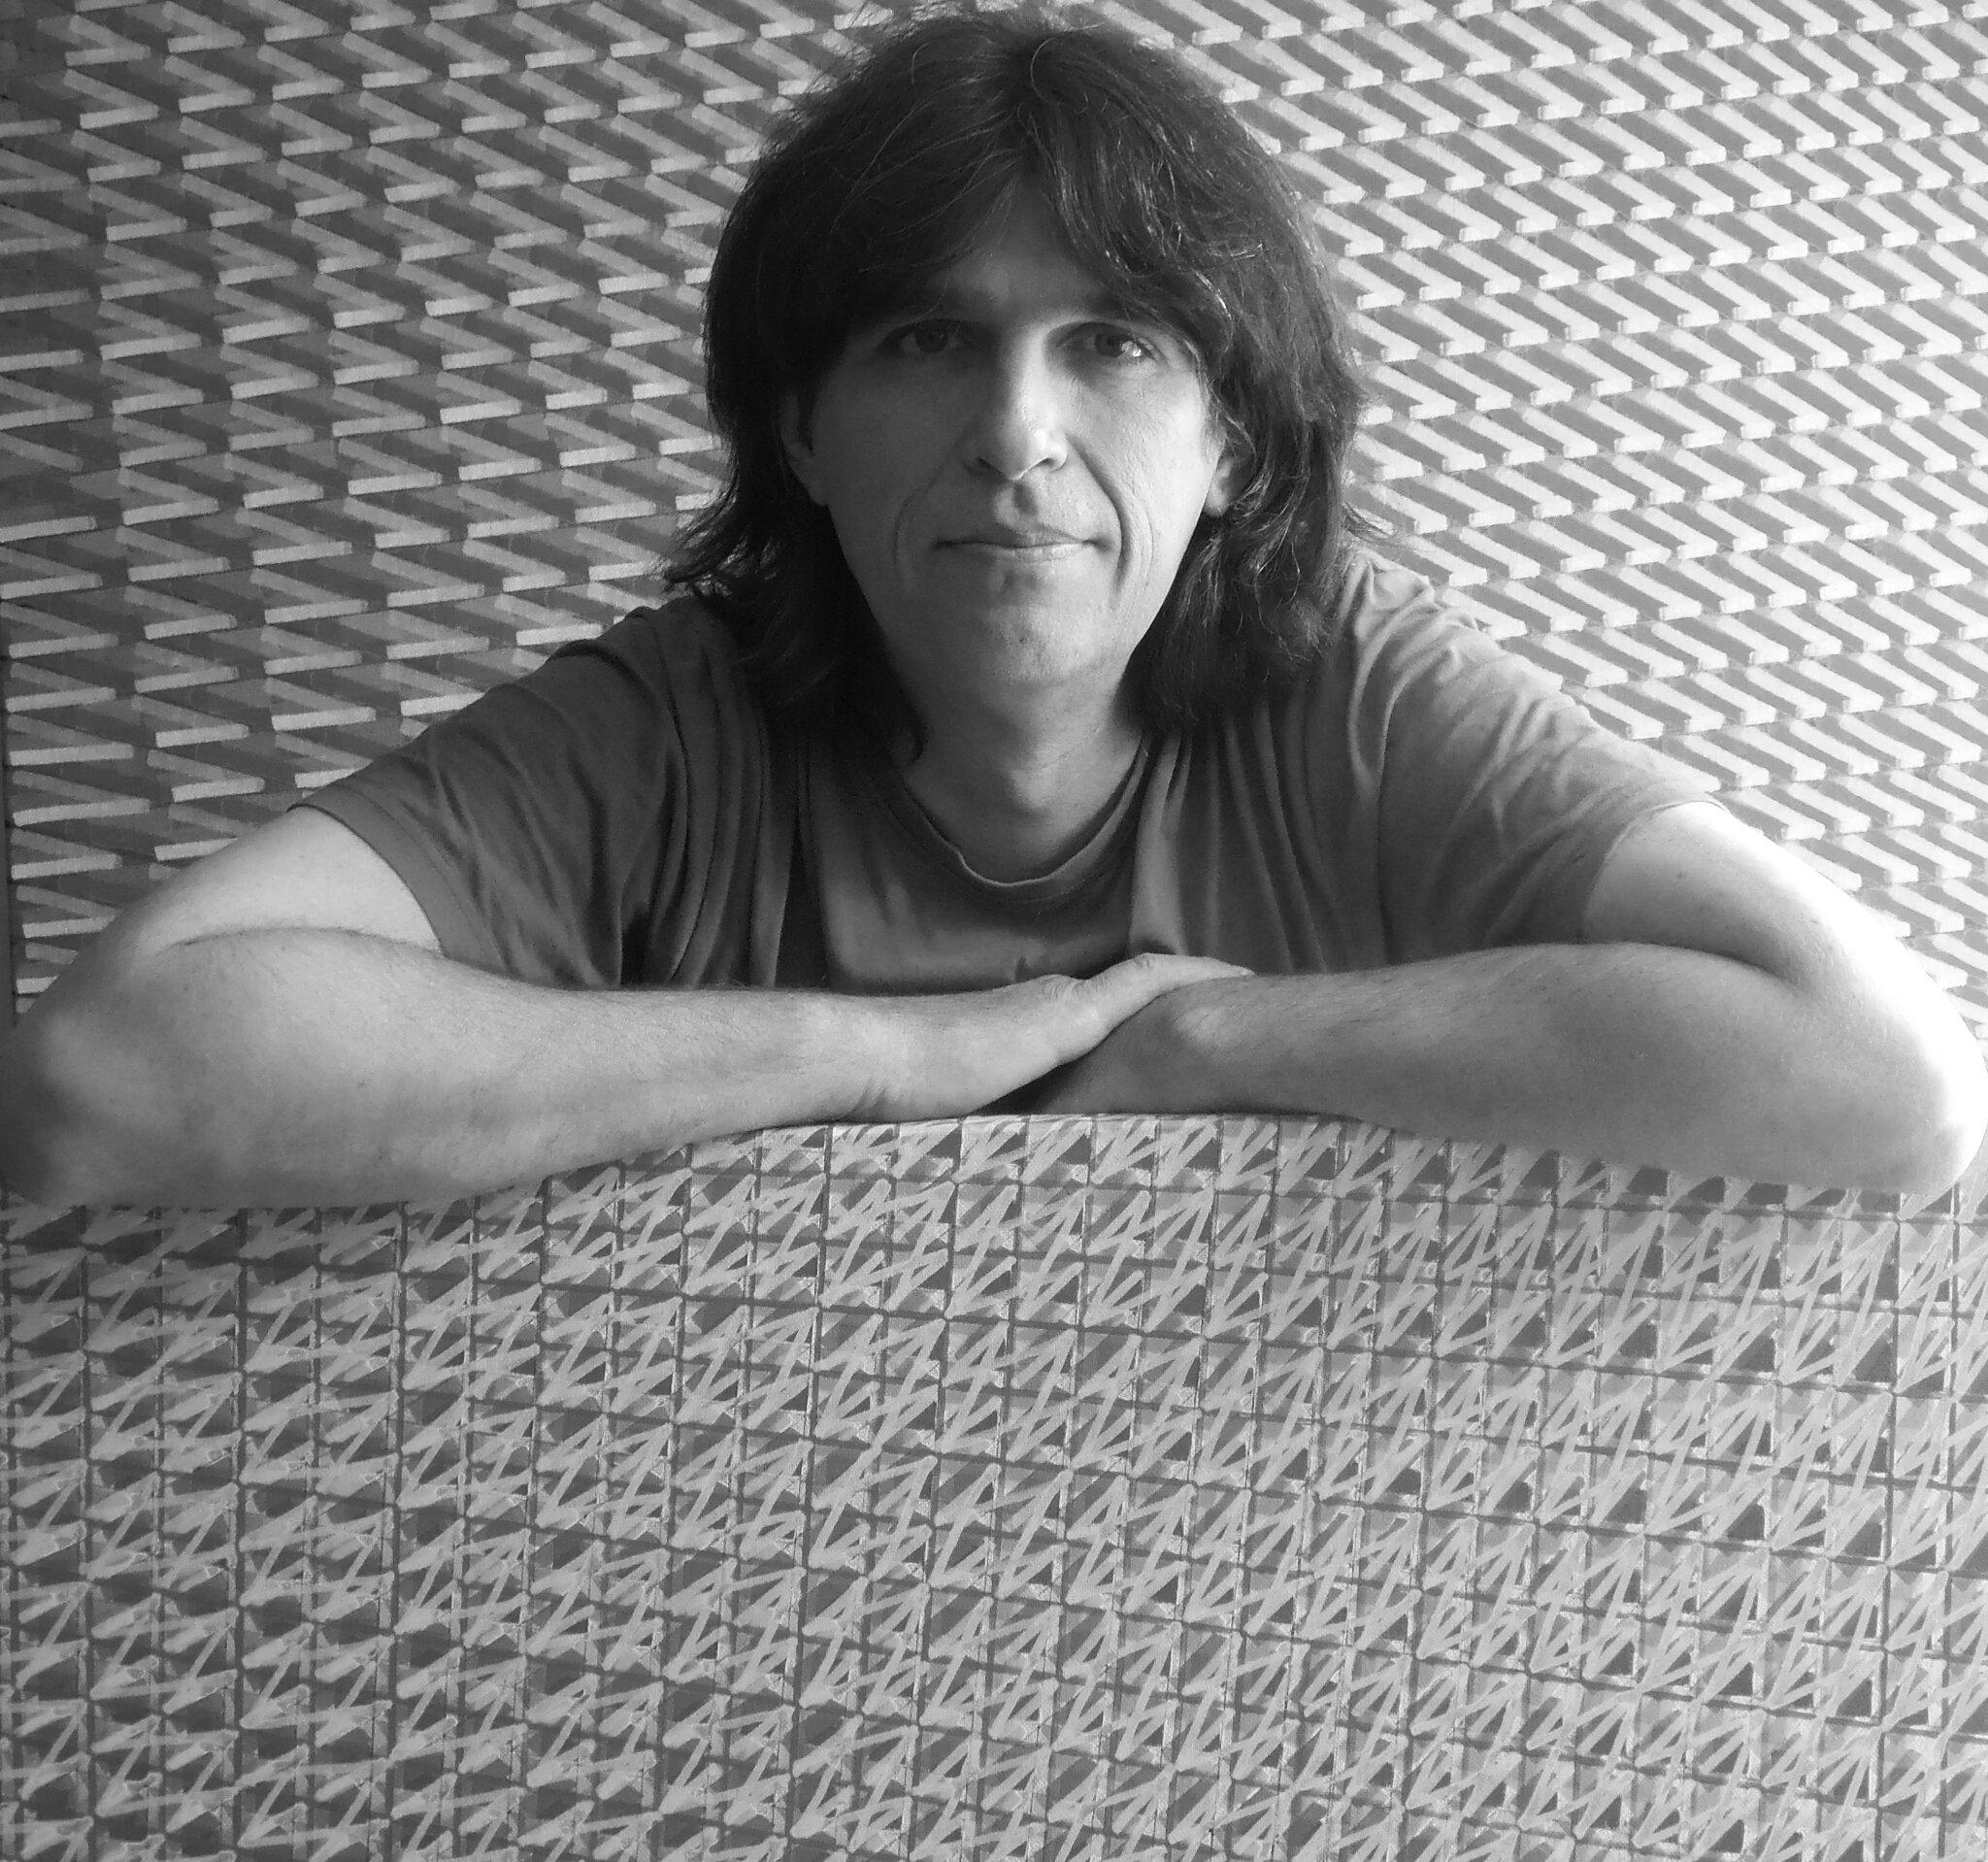 artiste peintre troyes luartiste peintre jean renault est dcd vendredi janvier les terrasses. Black Bedroom Furniture Sets. Home Design Ideas